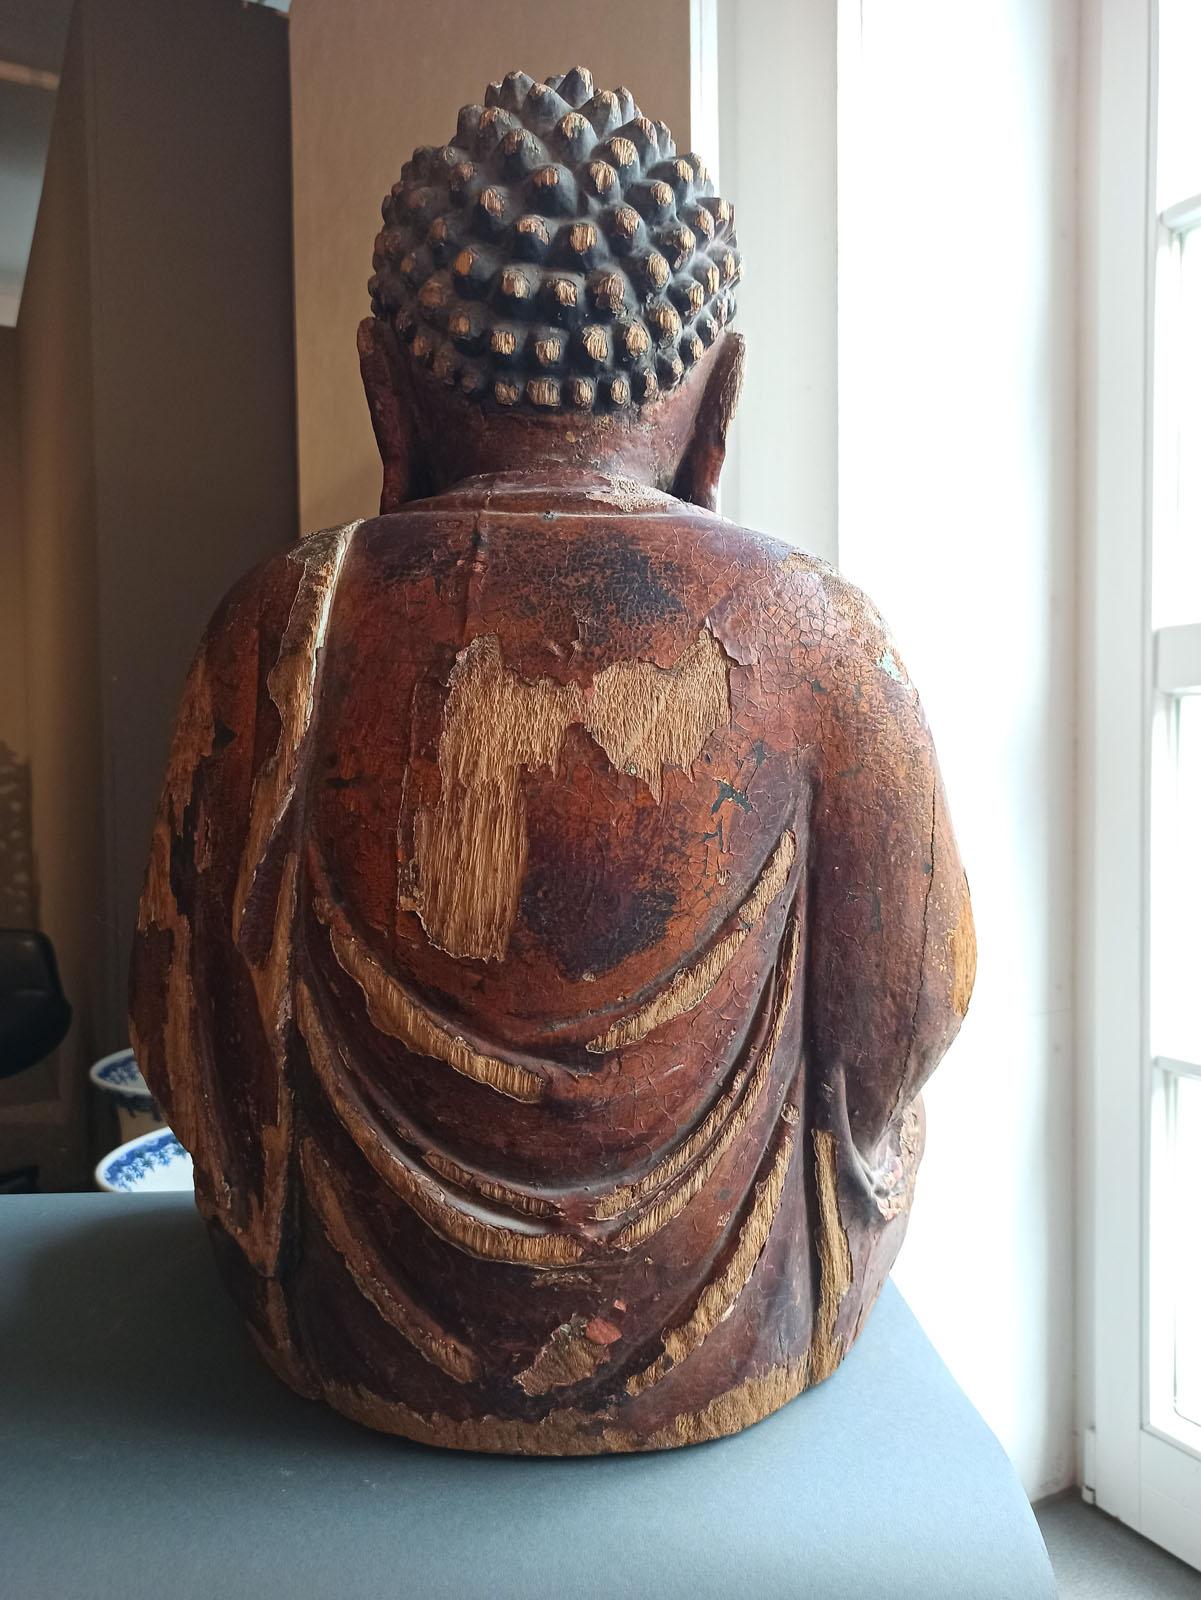 A GILT-LACQUERED CARVED WOOD FIGURE OF SEATED BUDDHA SHAKYAMUNI - Image 12 of 13